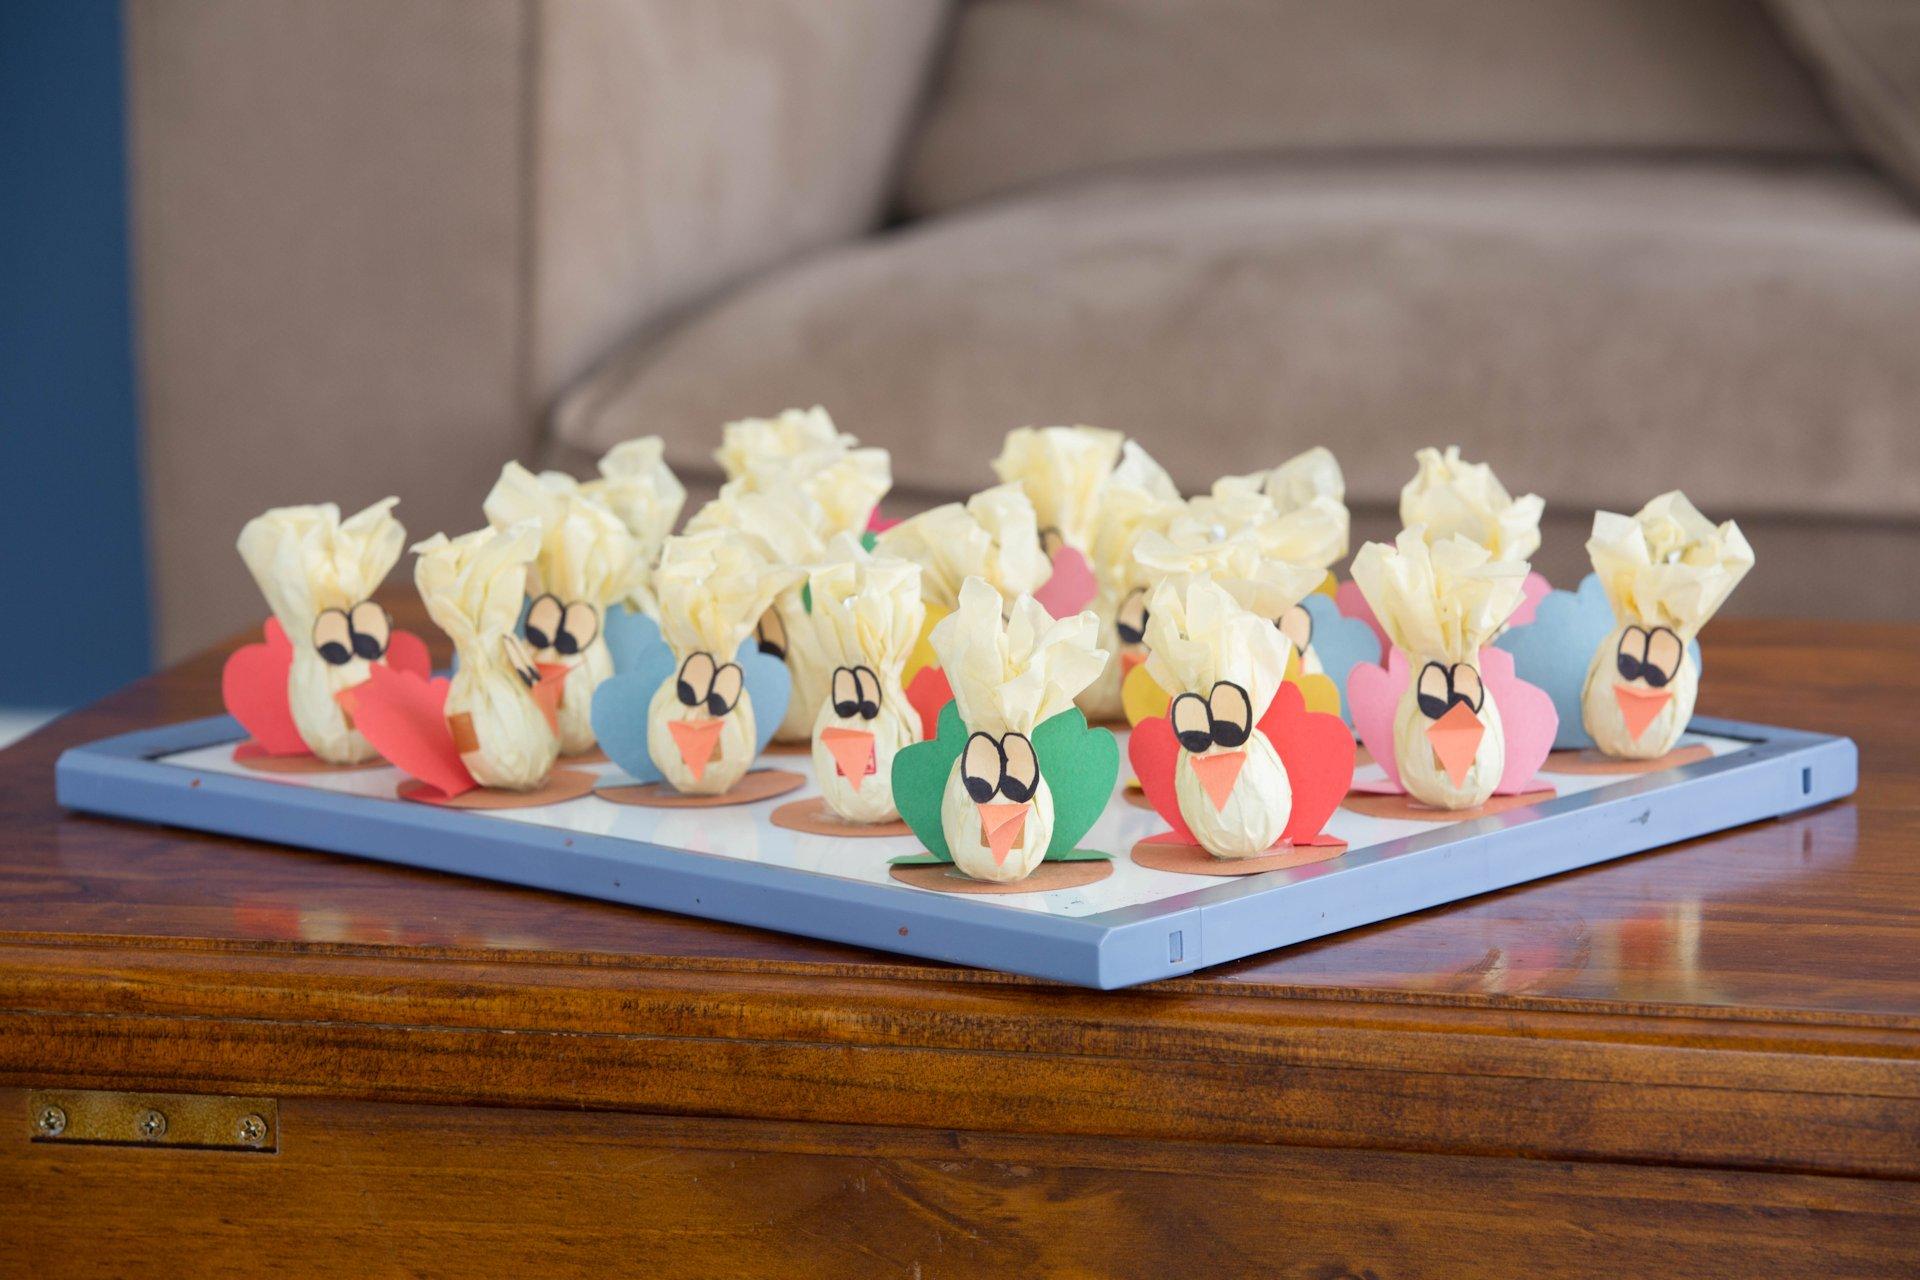 Praline turkeys awaiting their end...